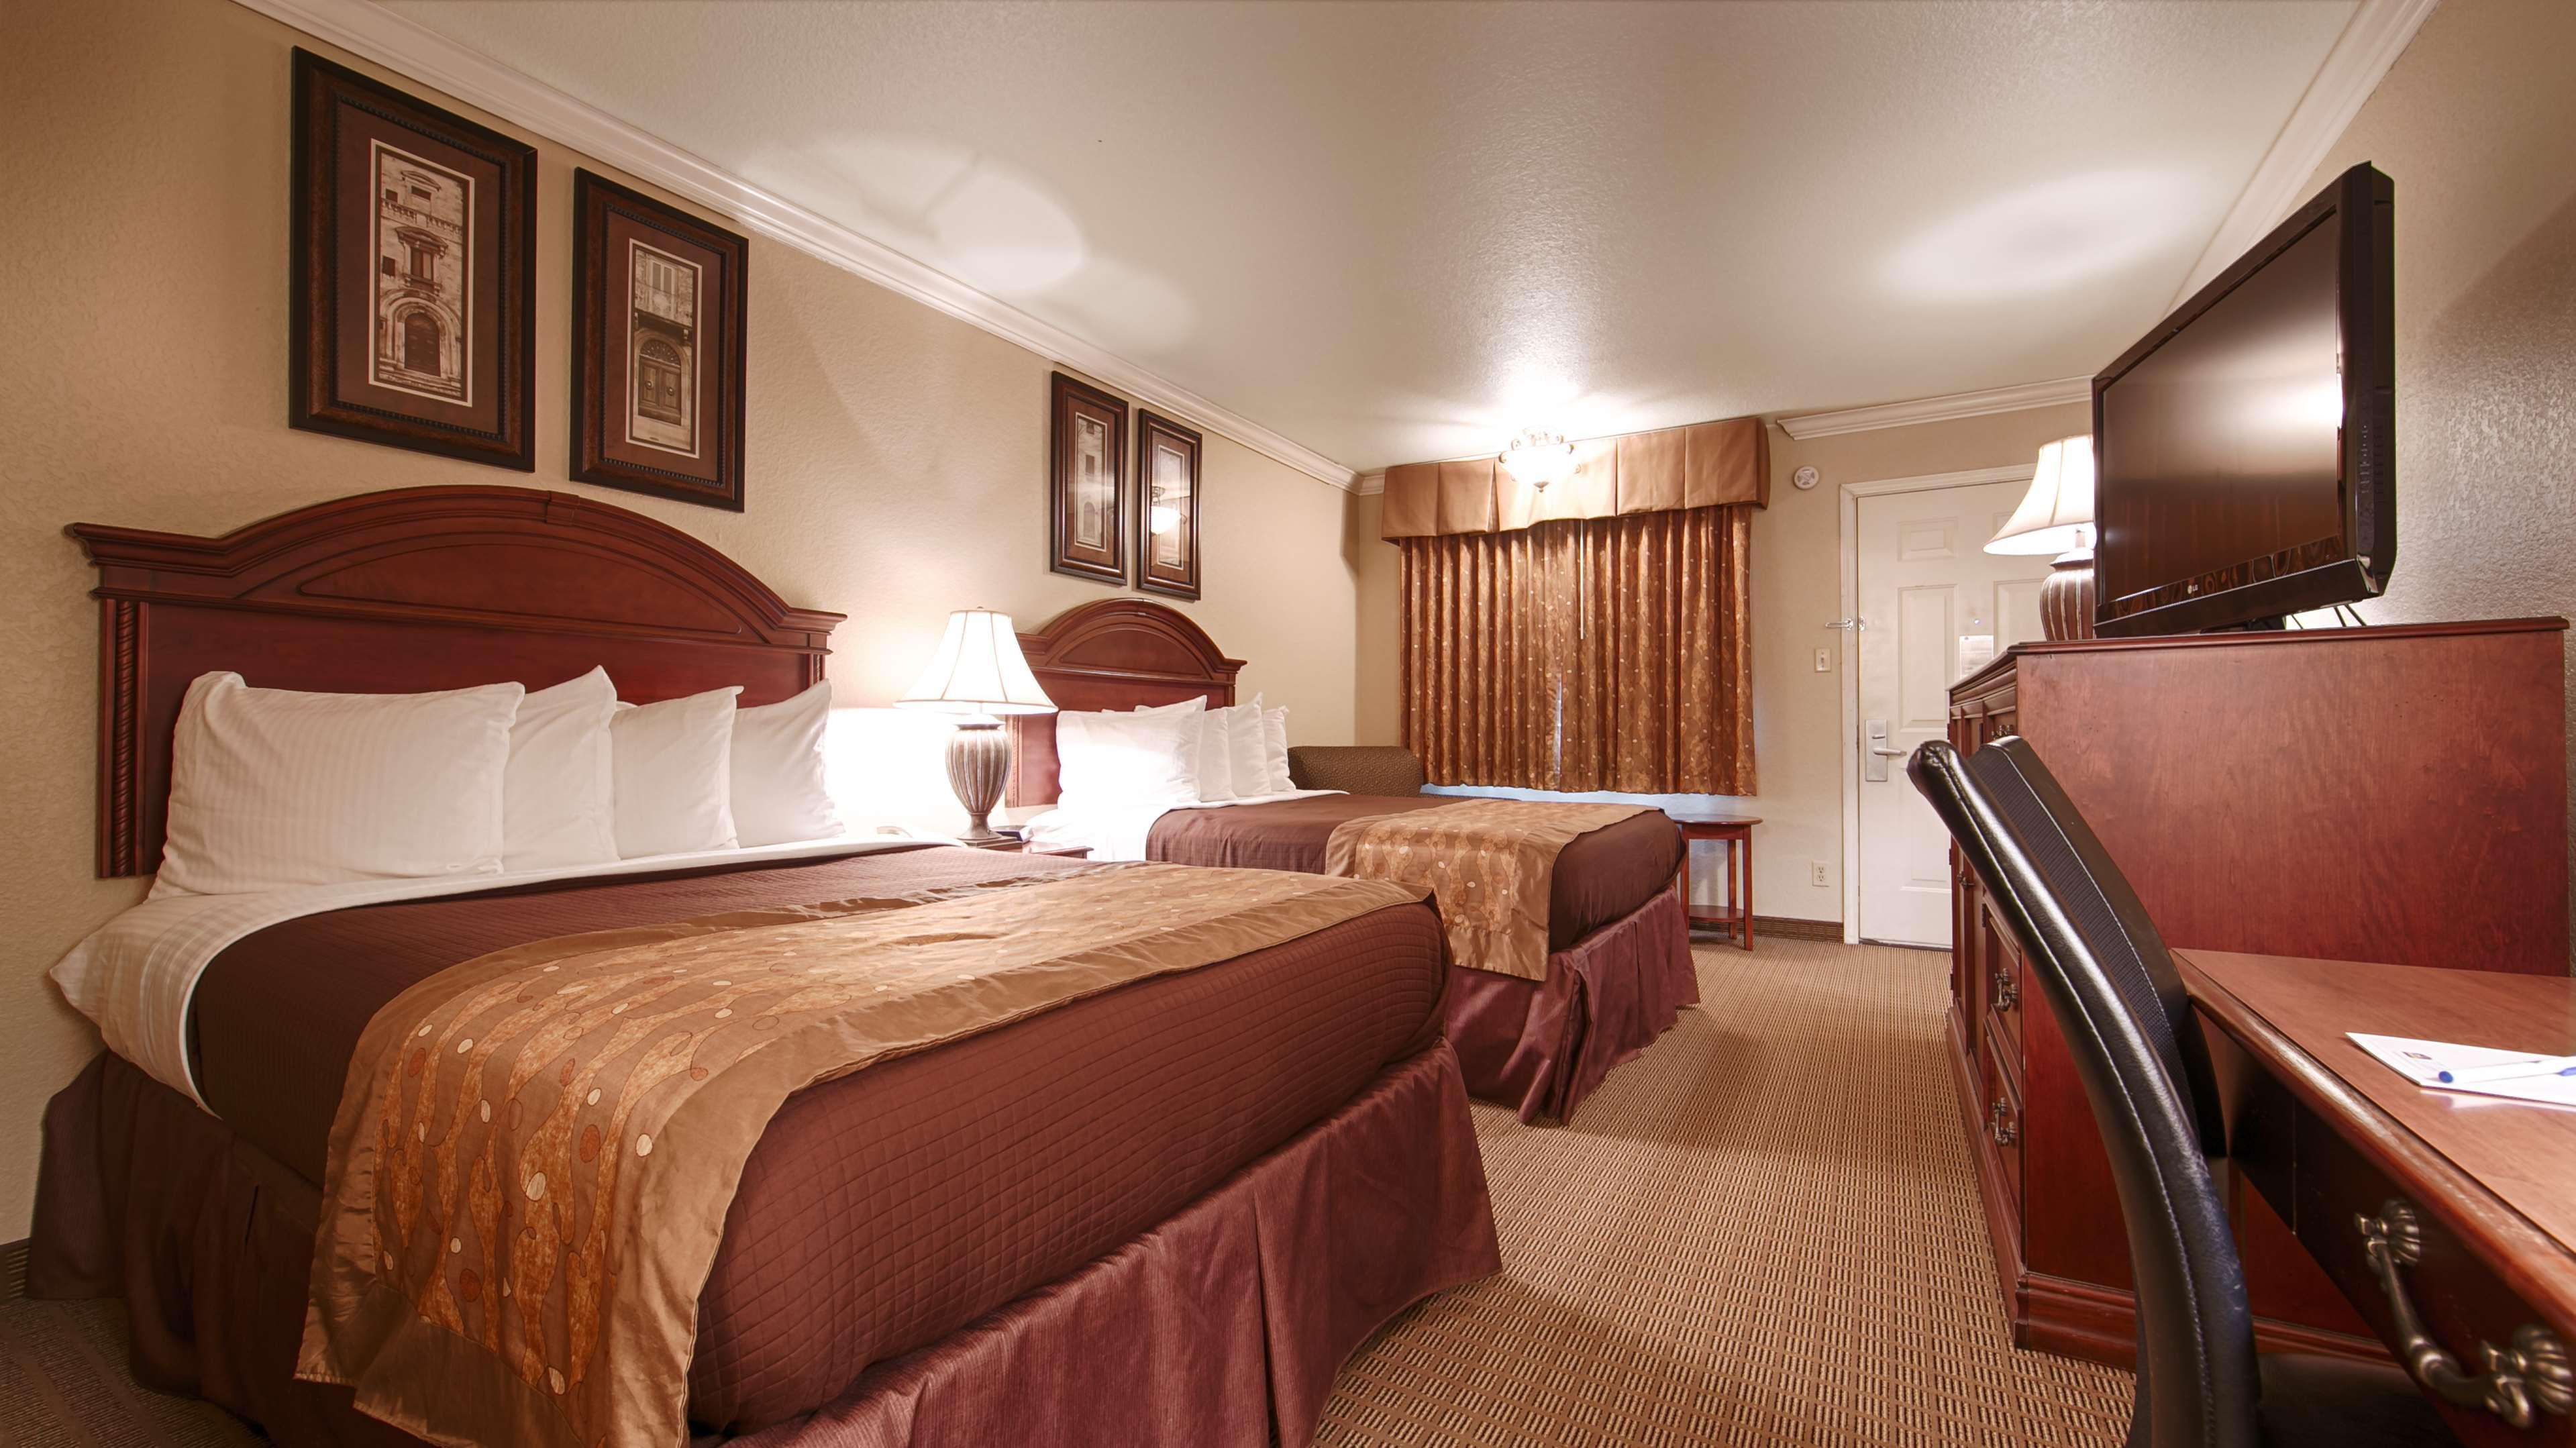 Best Western Inn of McAlester image 18